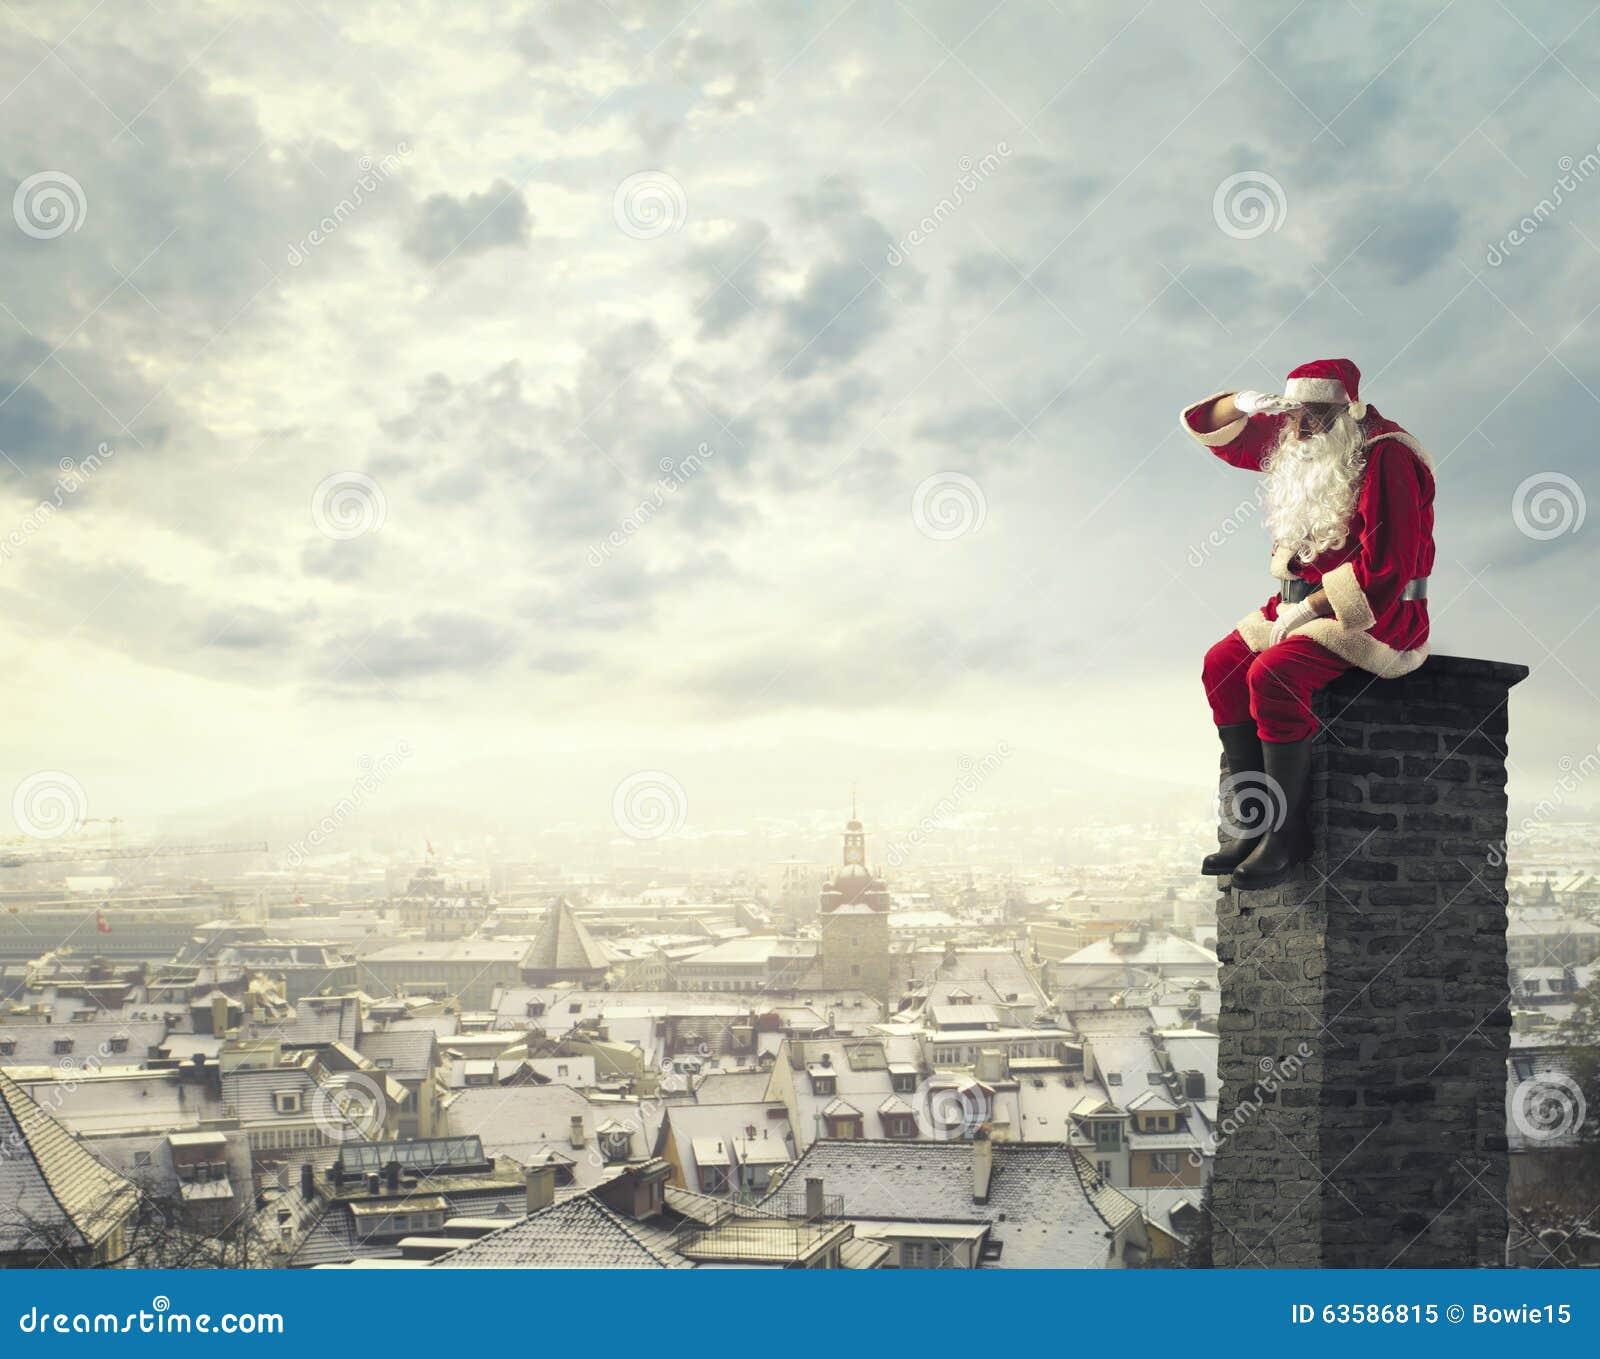 Sitting On The Chimney Stock Image Image Of House